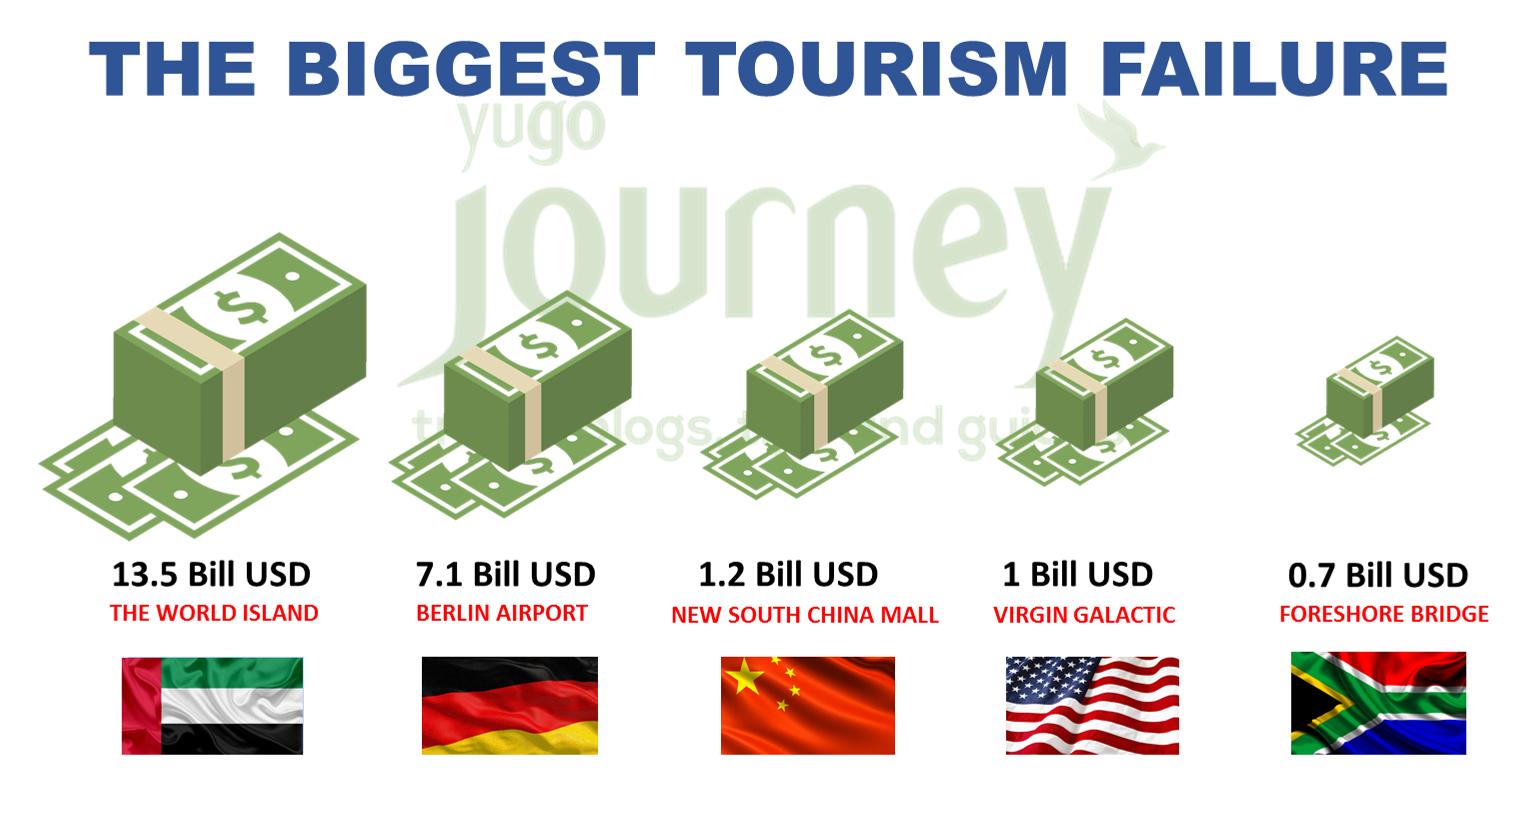 Tourism failure